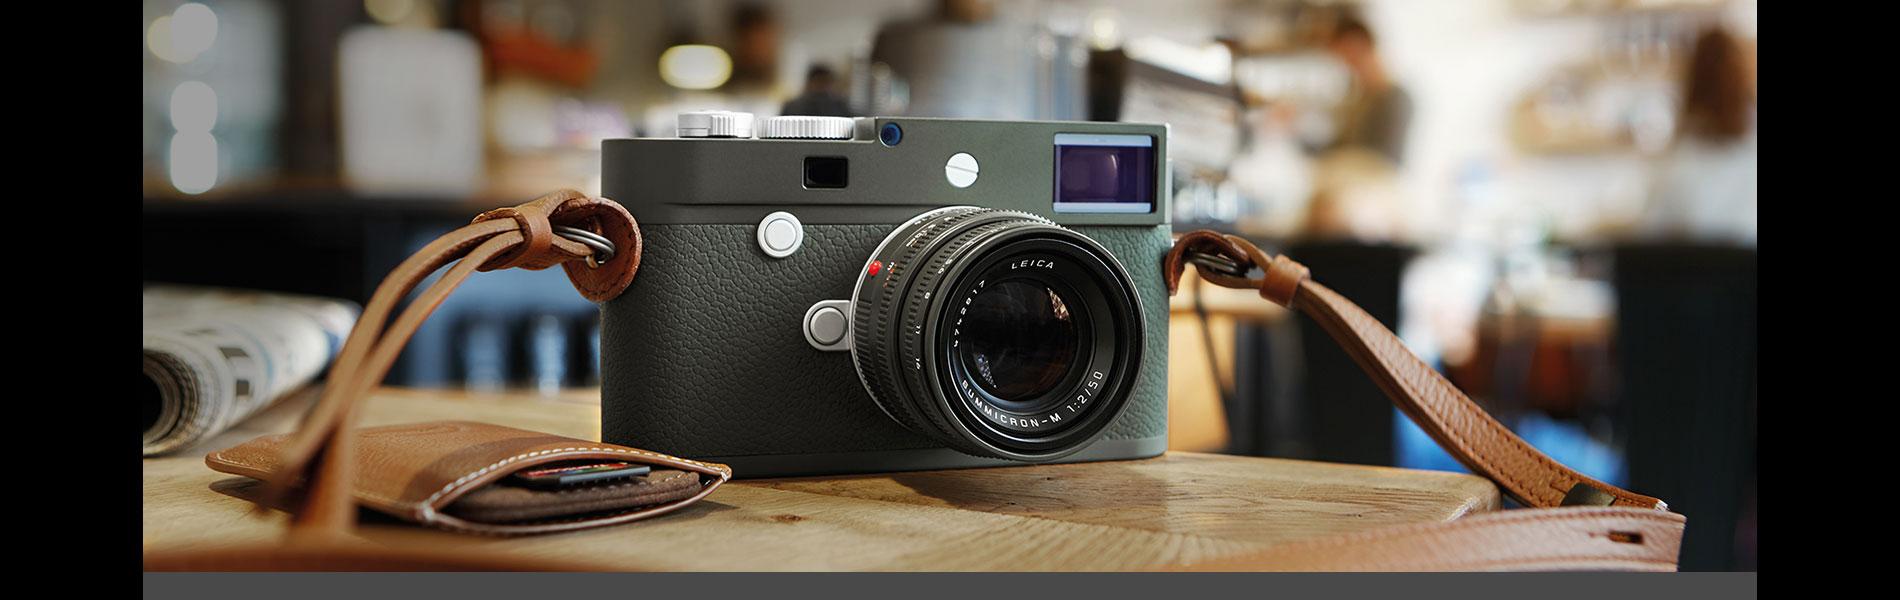 Leica M10-P & 50MM F2